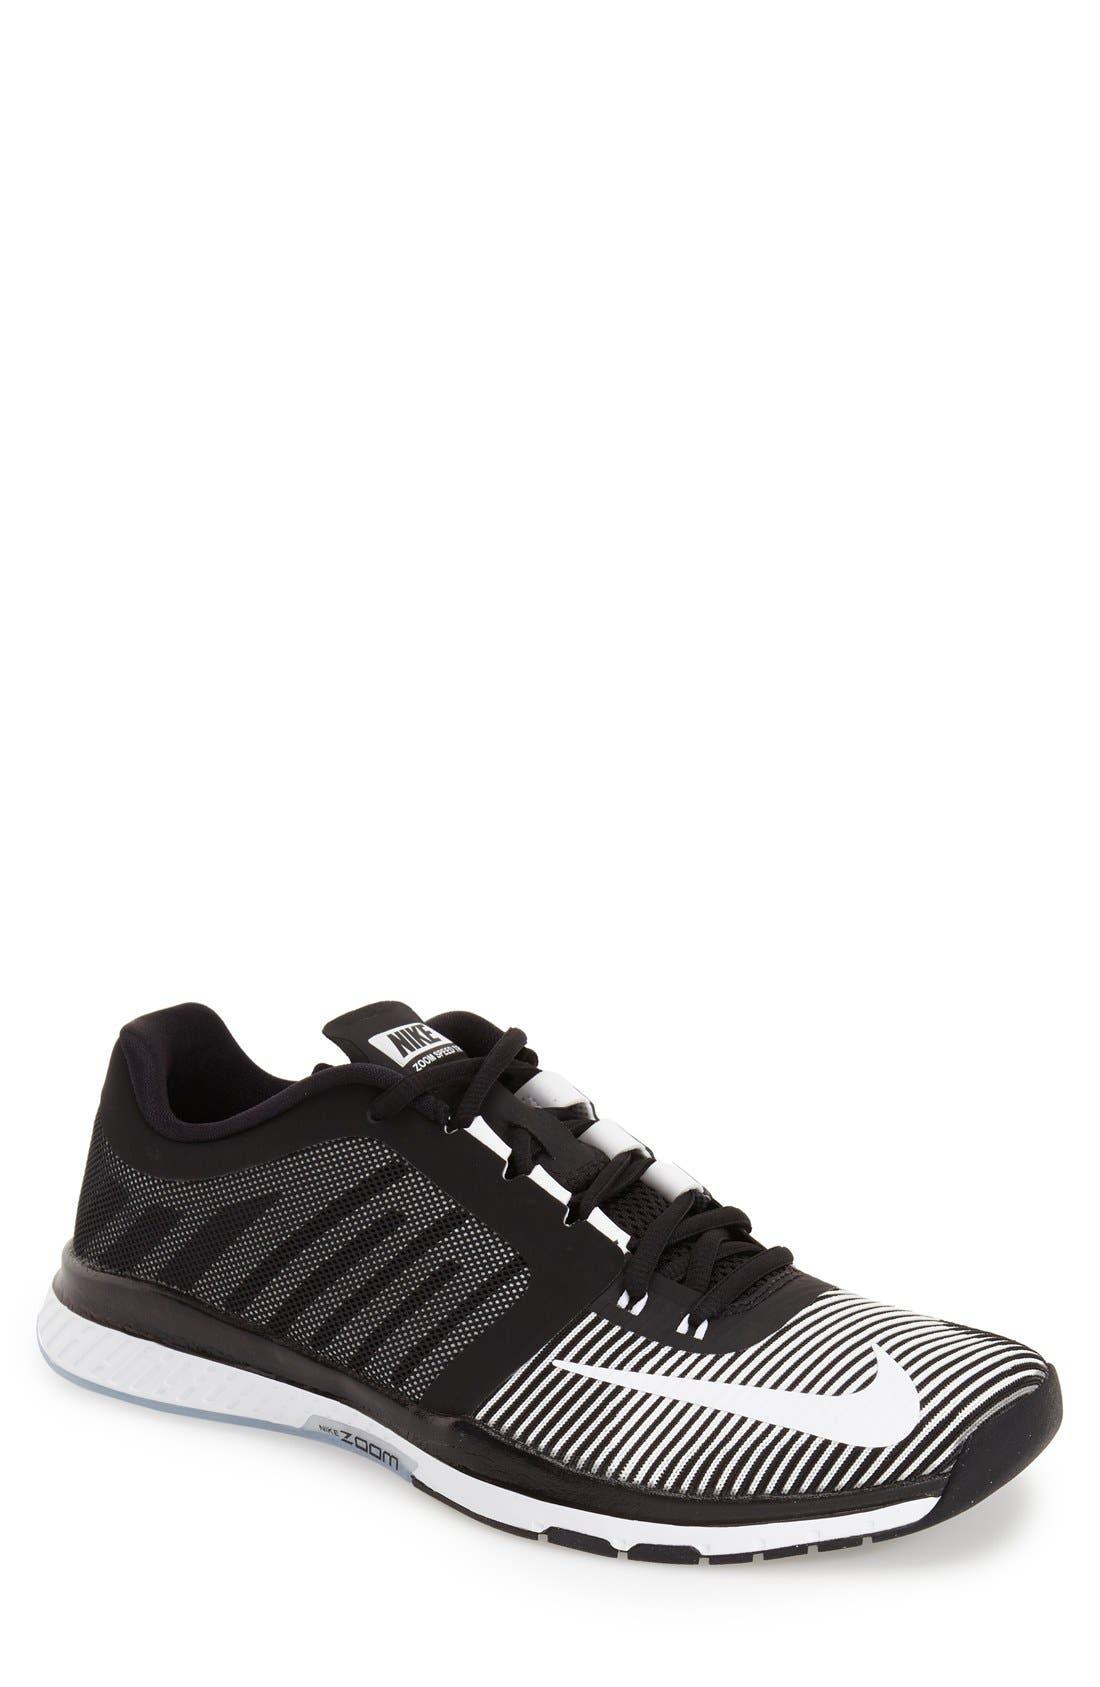 Nike Zoom Speed Tr 2015 Training Shoe Men Nordstrom